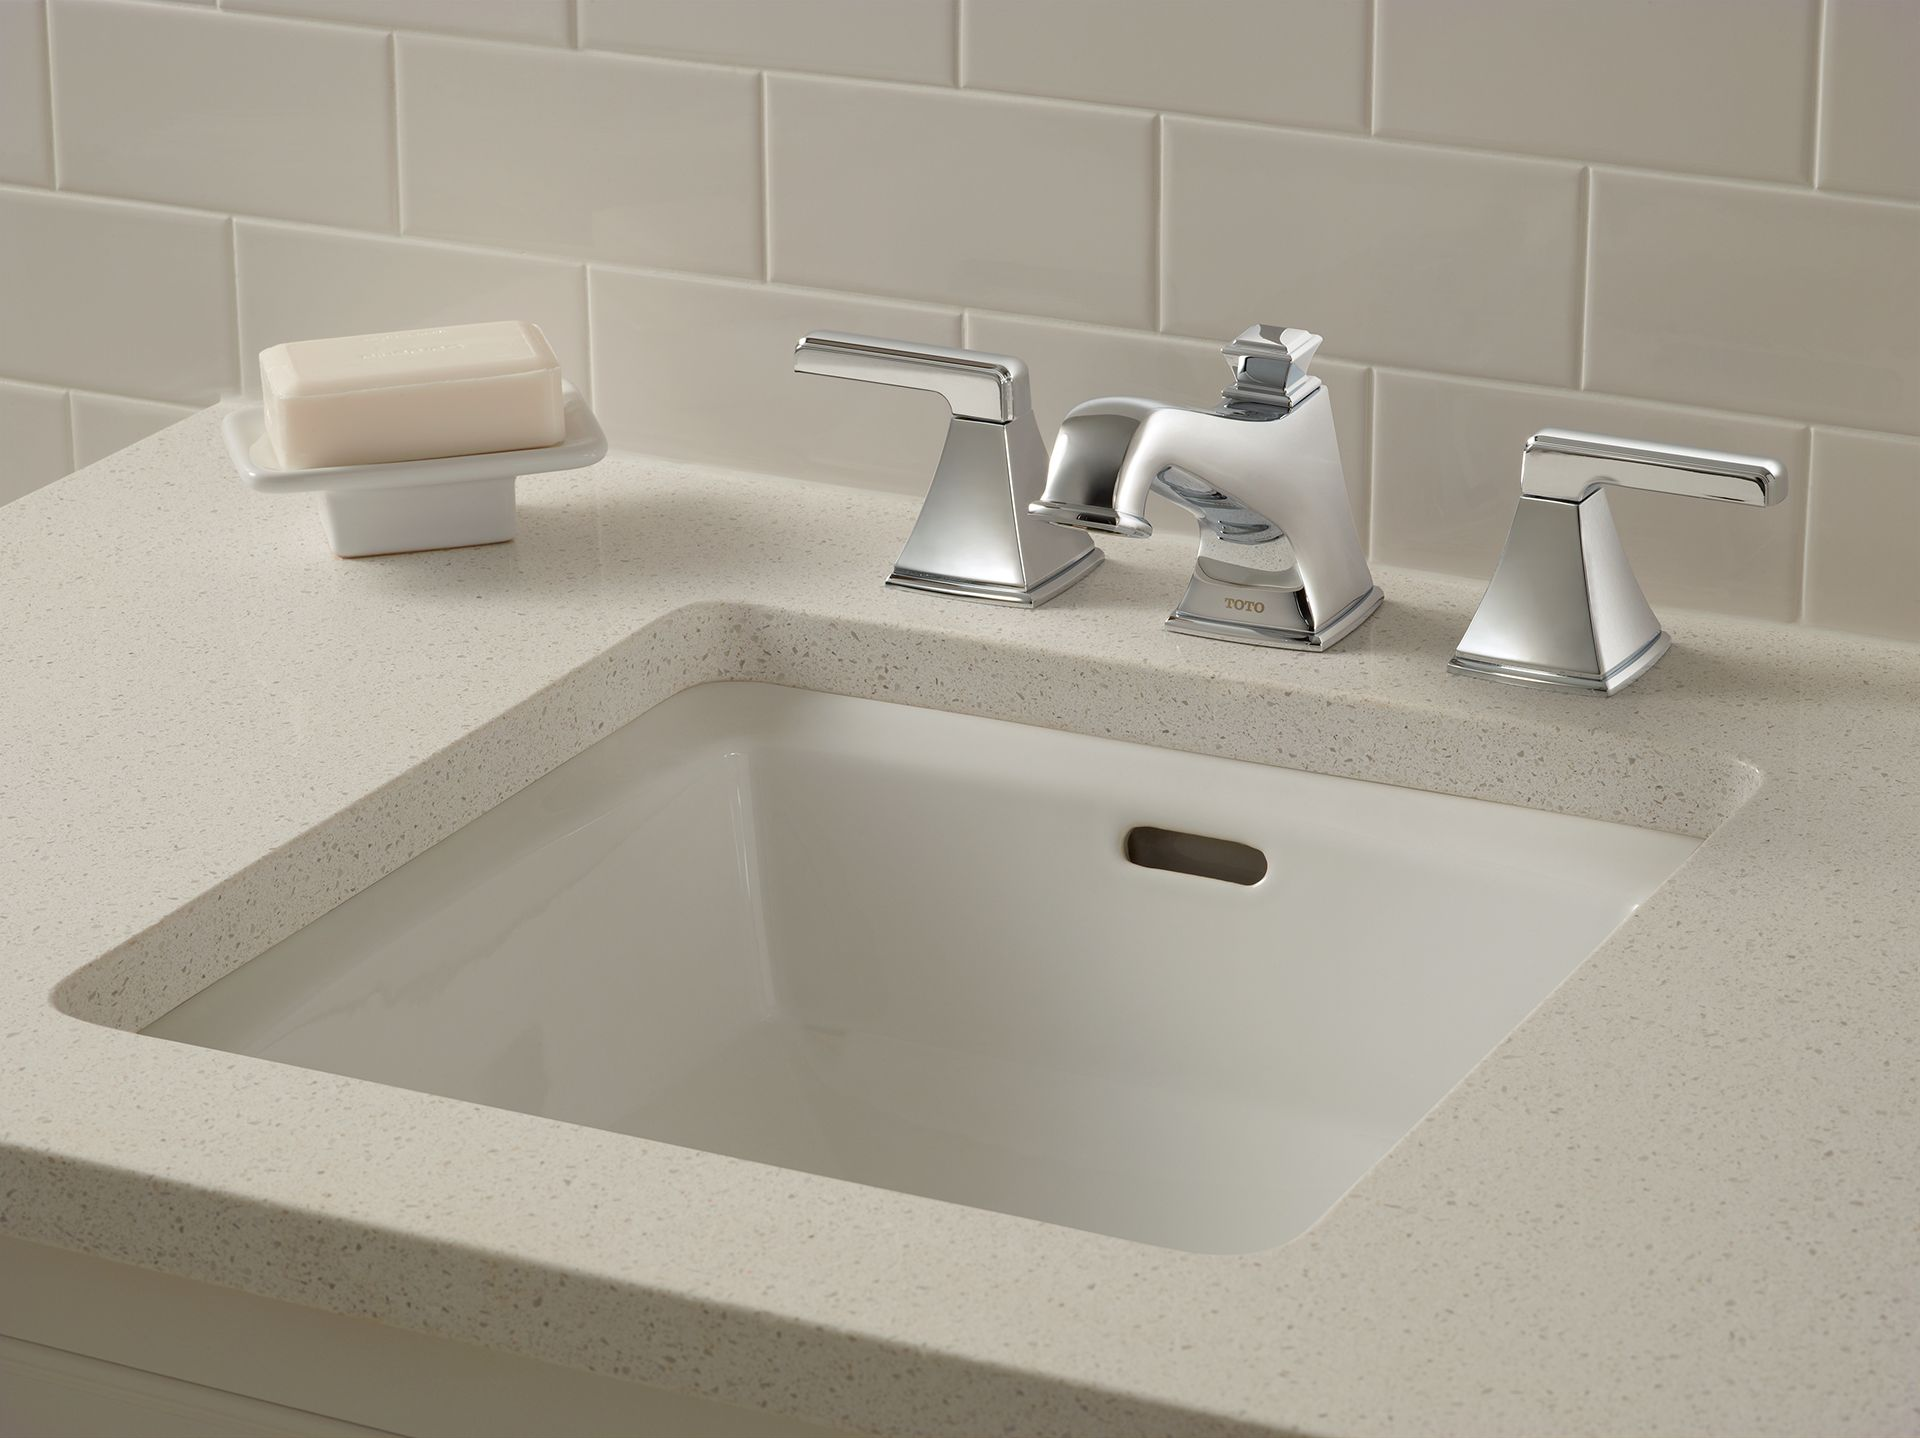 Connelly™ Widespread Lavatory Faucet - TotoUSA.com